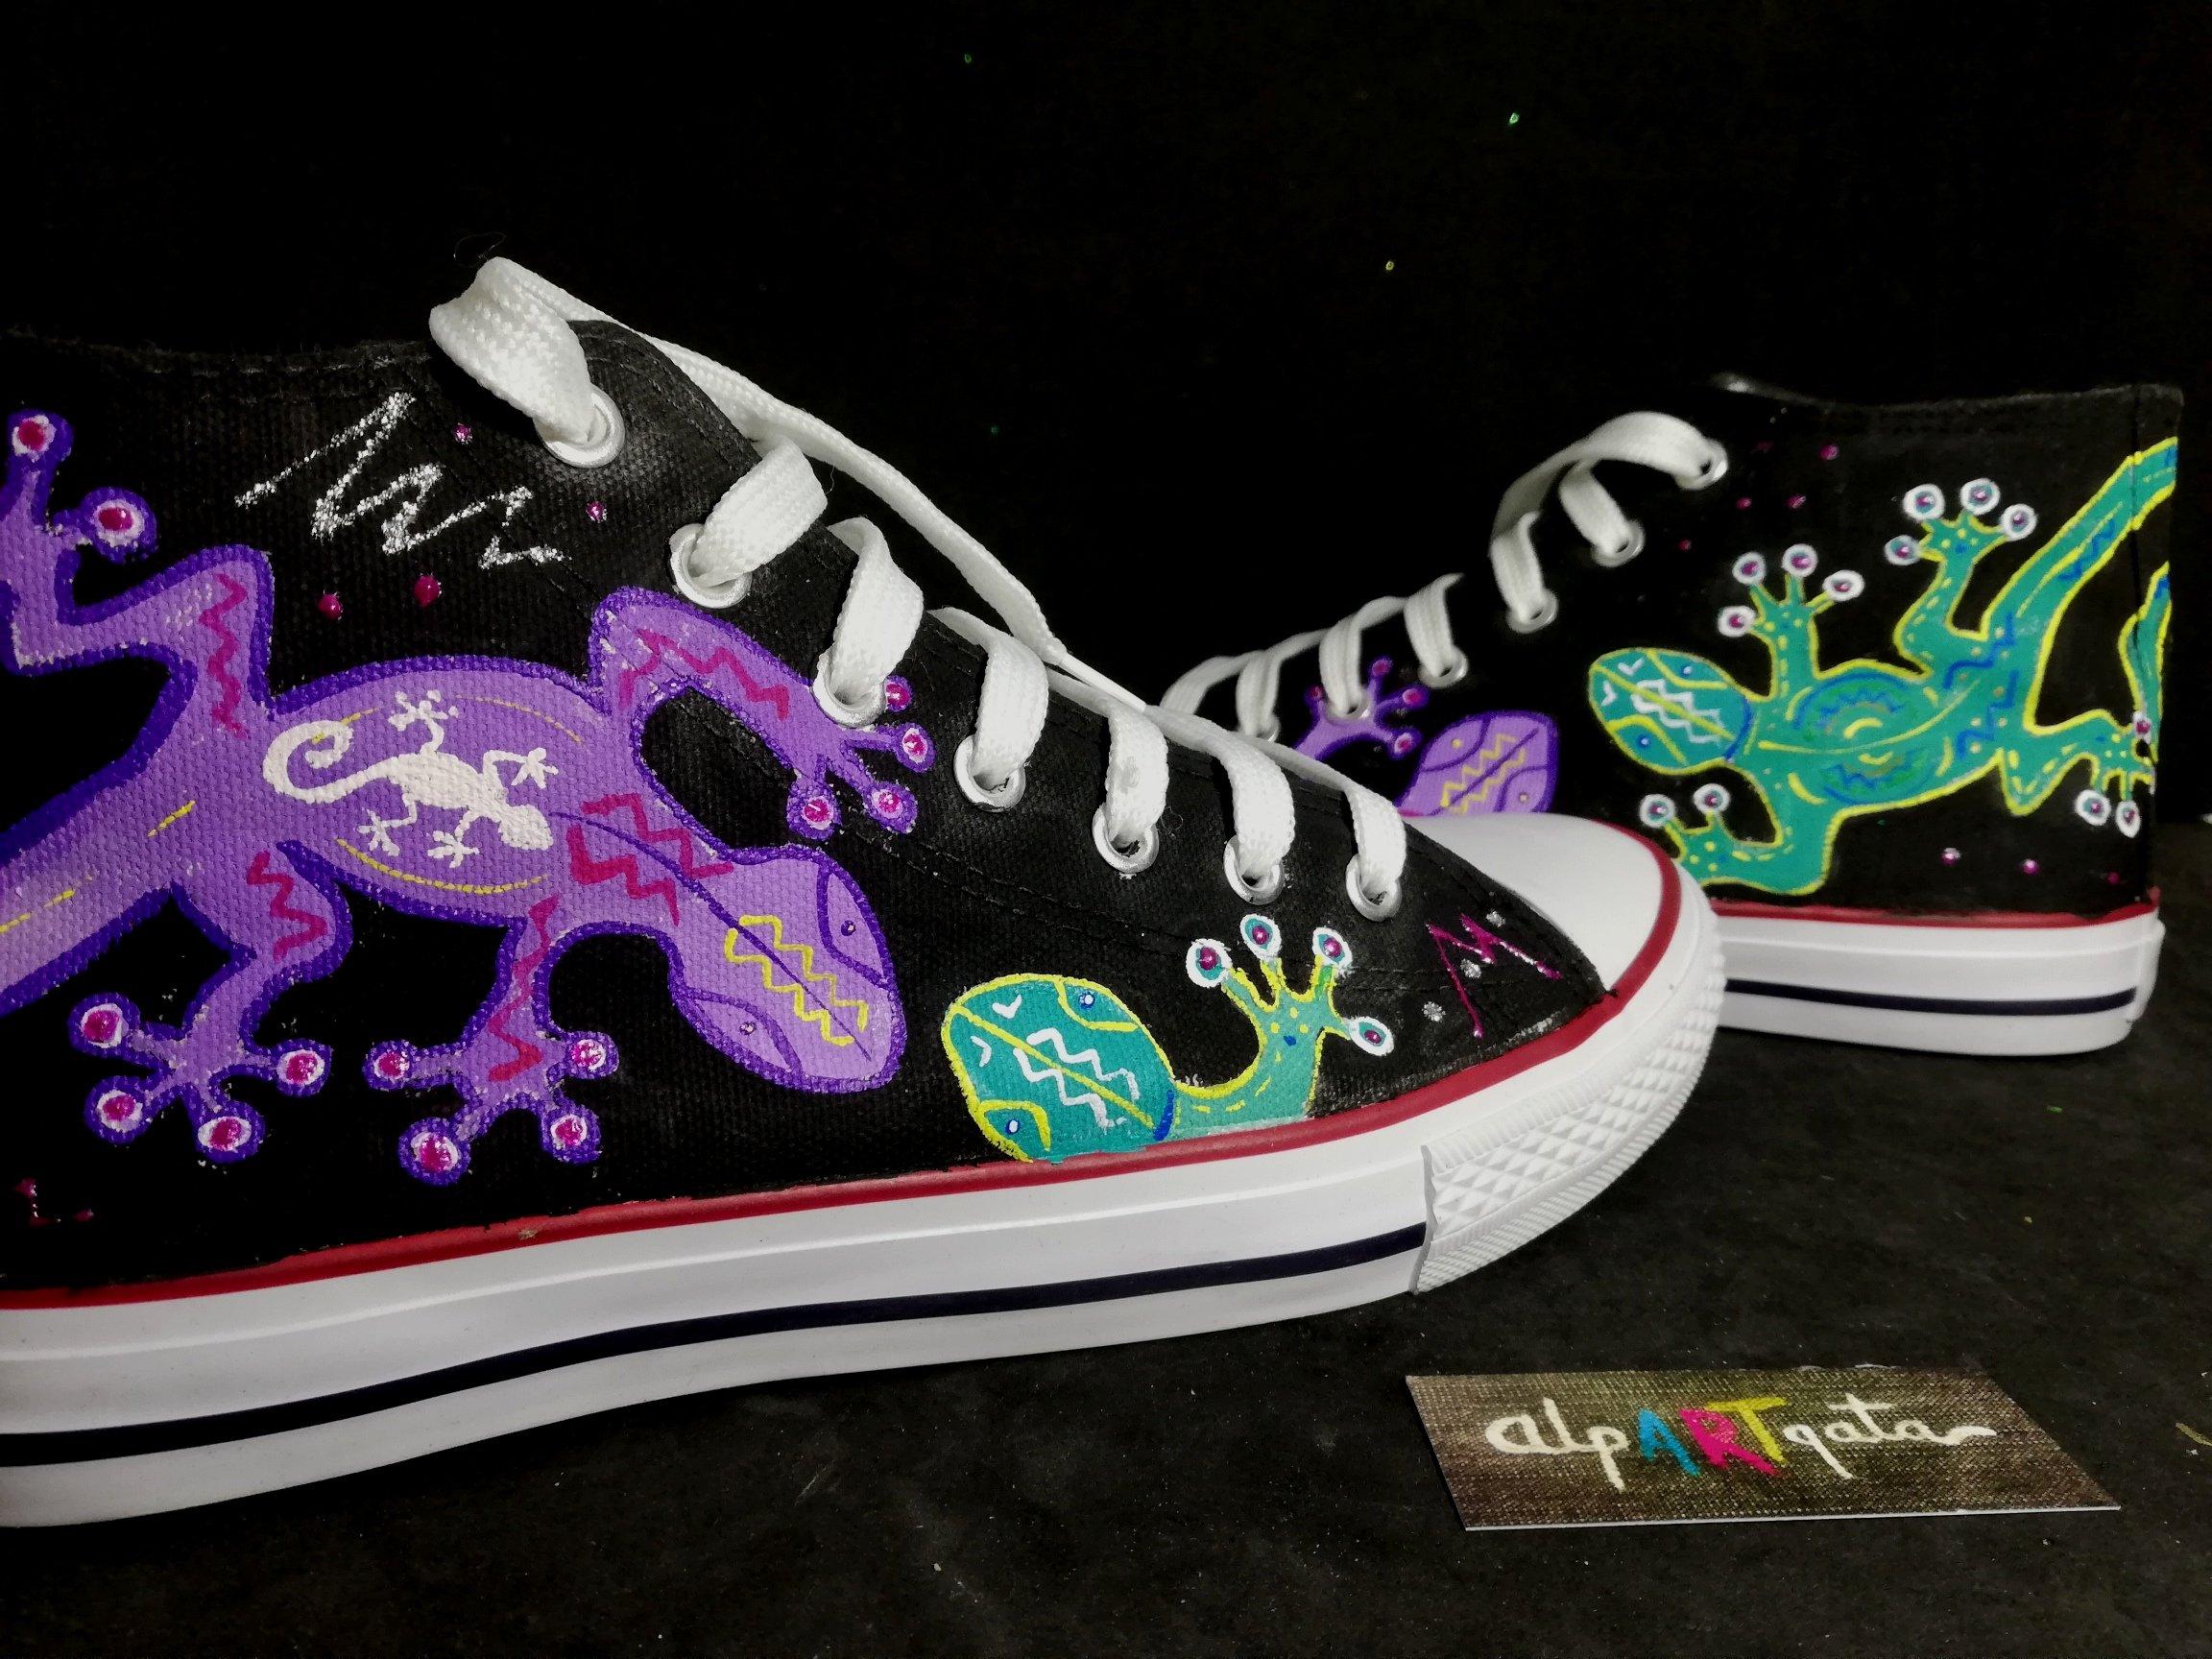 wpid-zapatillas-pintadas-alpartgata-salamandras-68810364616716396831..jpg